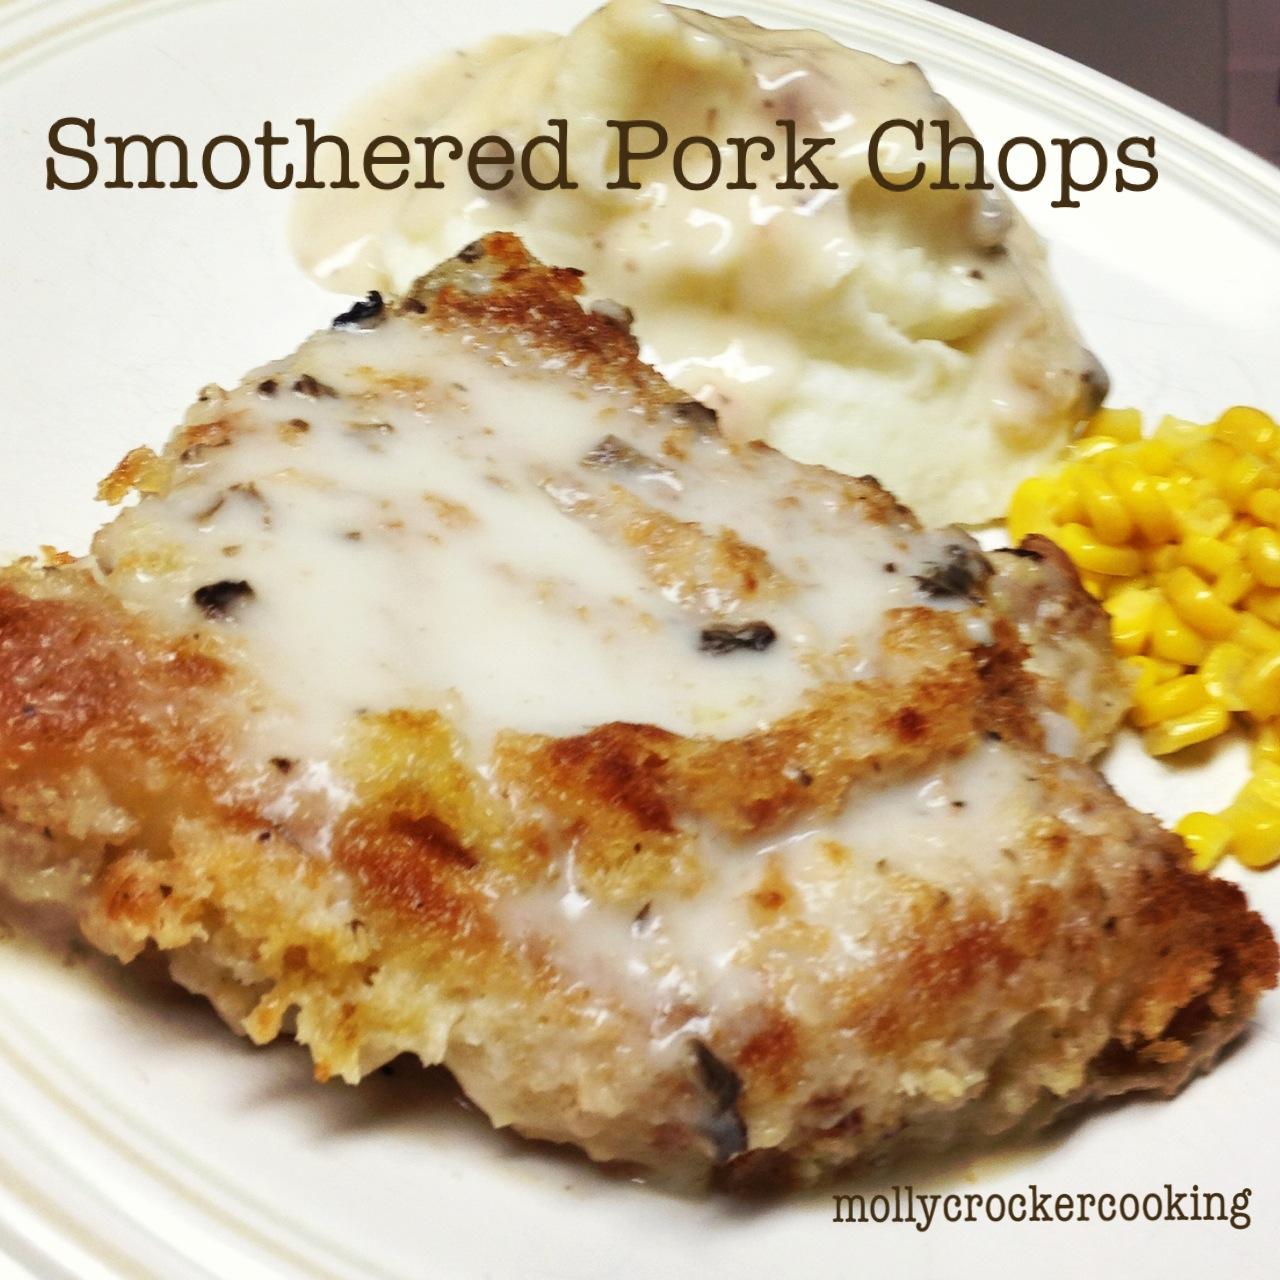 molly crocker cooking smothered pork chops